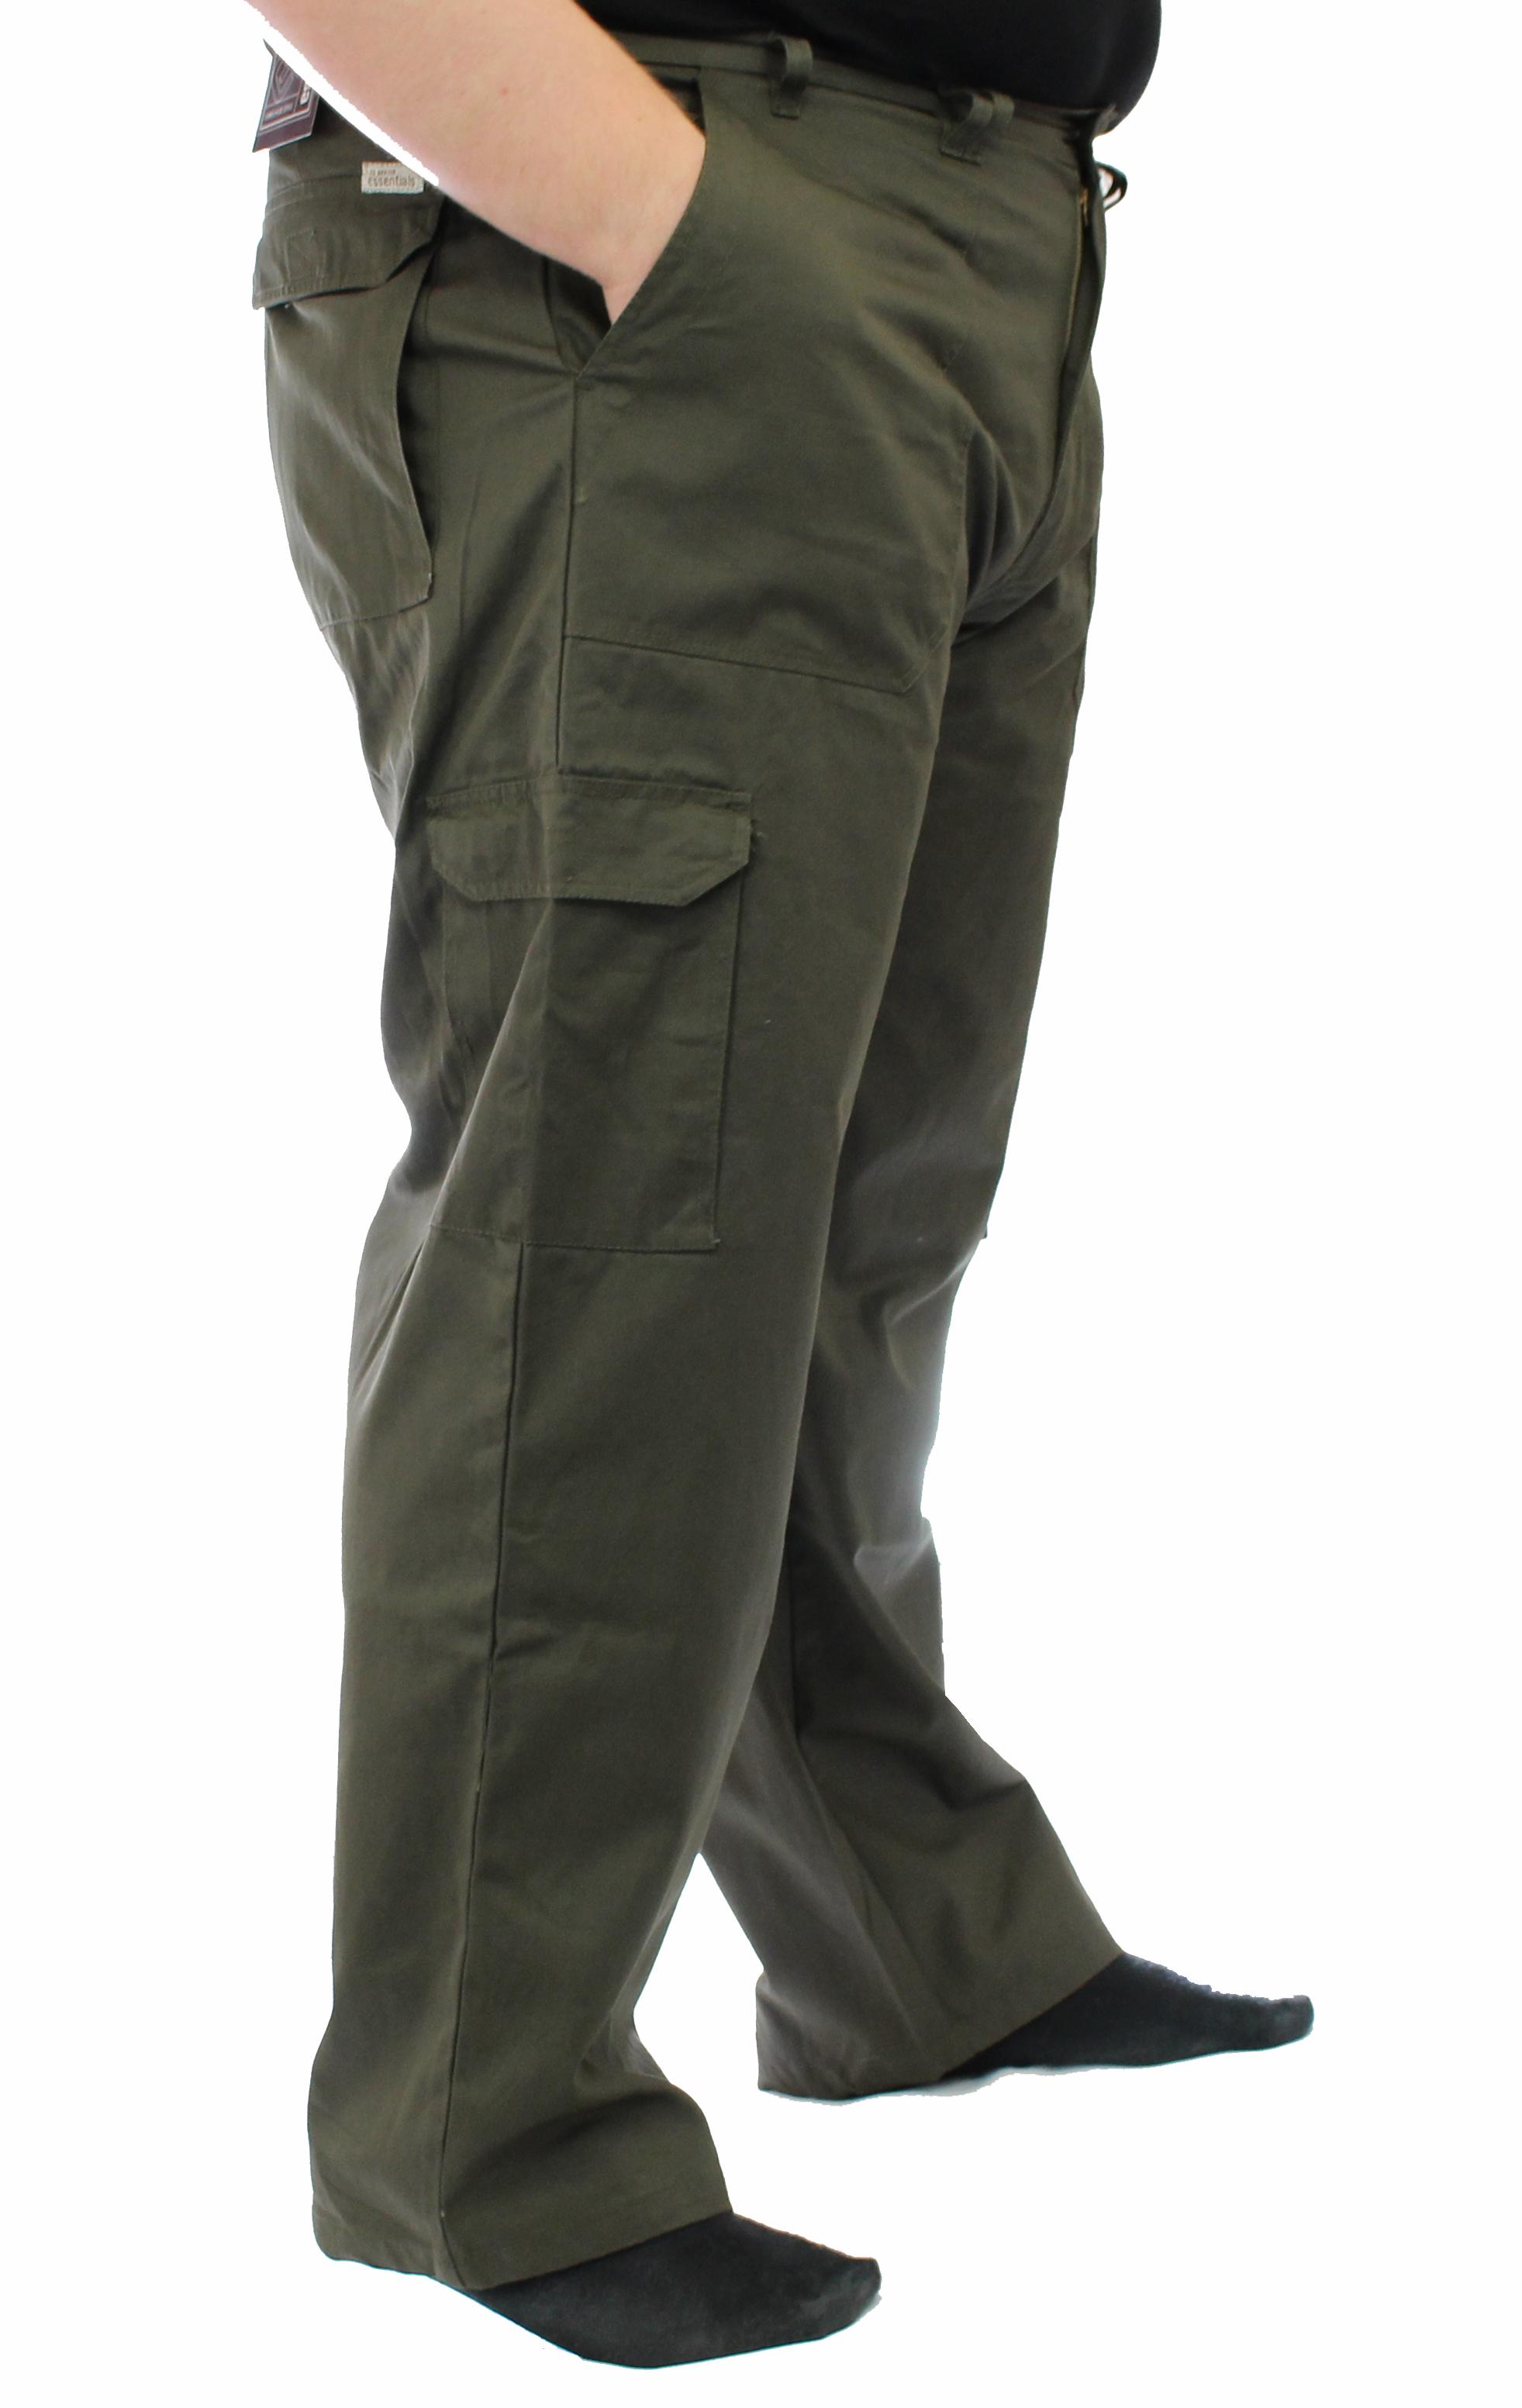 "Ed Baxter Victory - Heavy Duty Cargo Combat Trousers - Khaki - 64"" Waist, 32"" Leg"